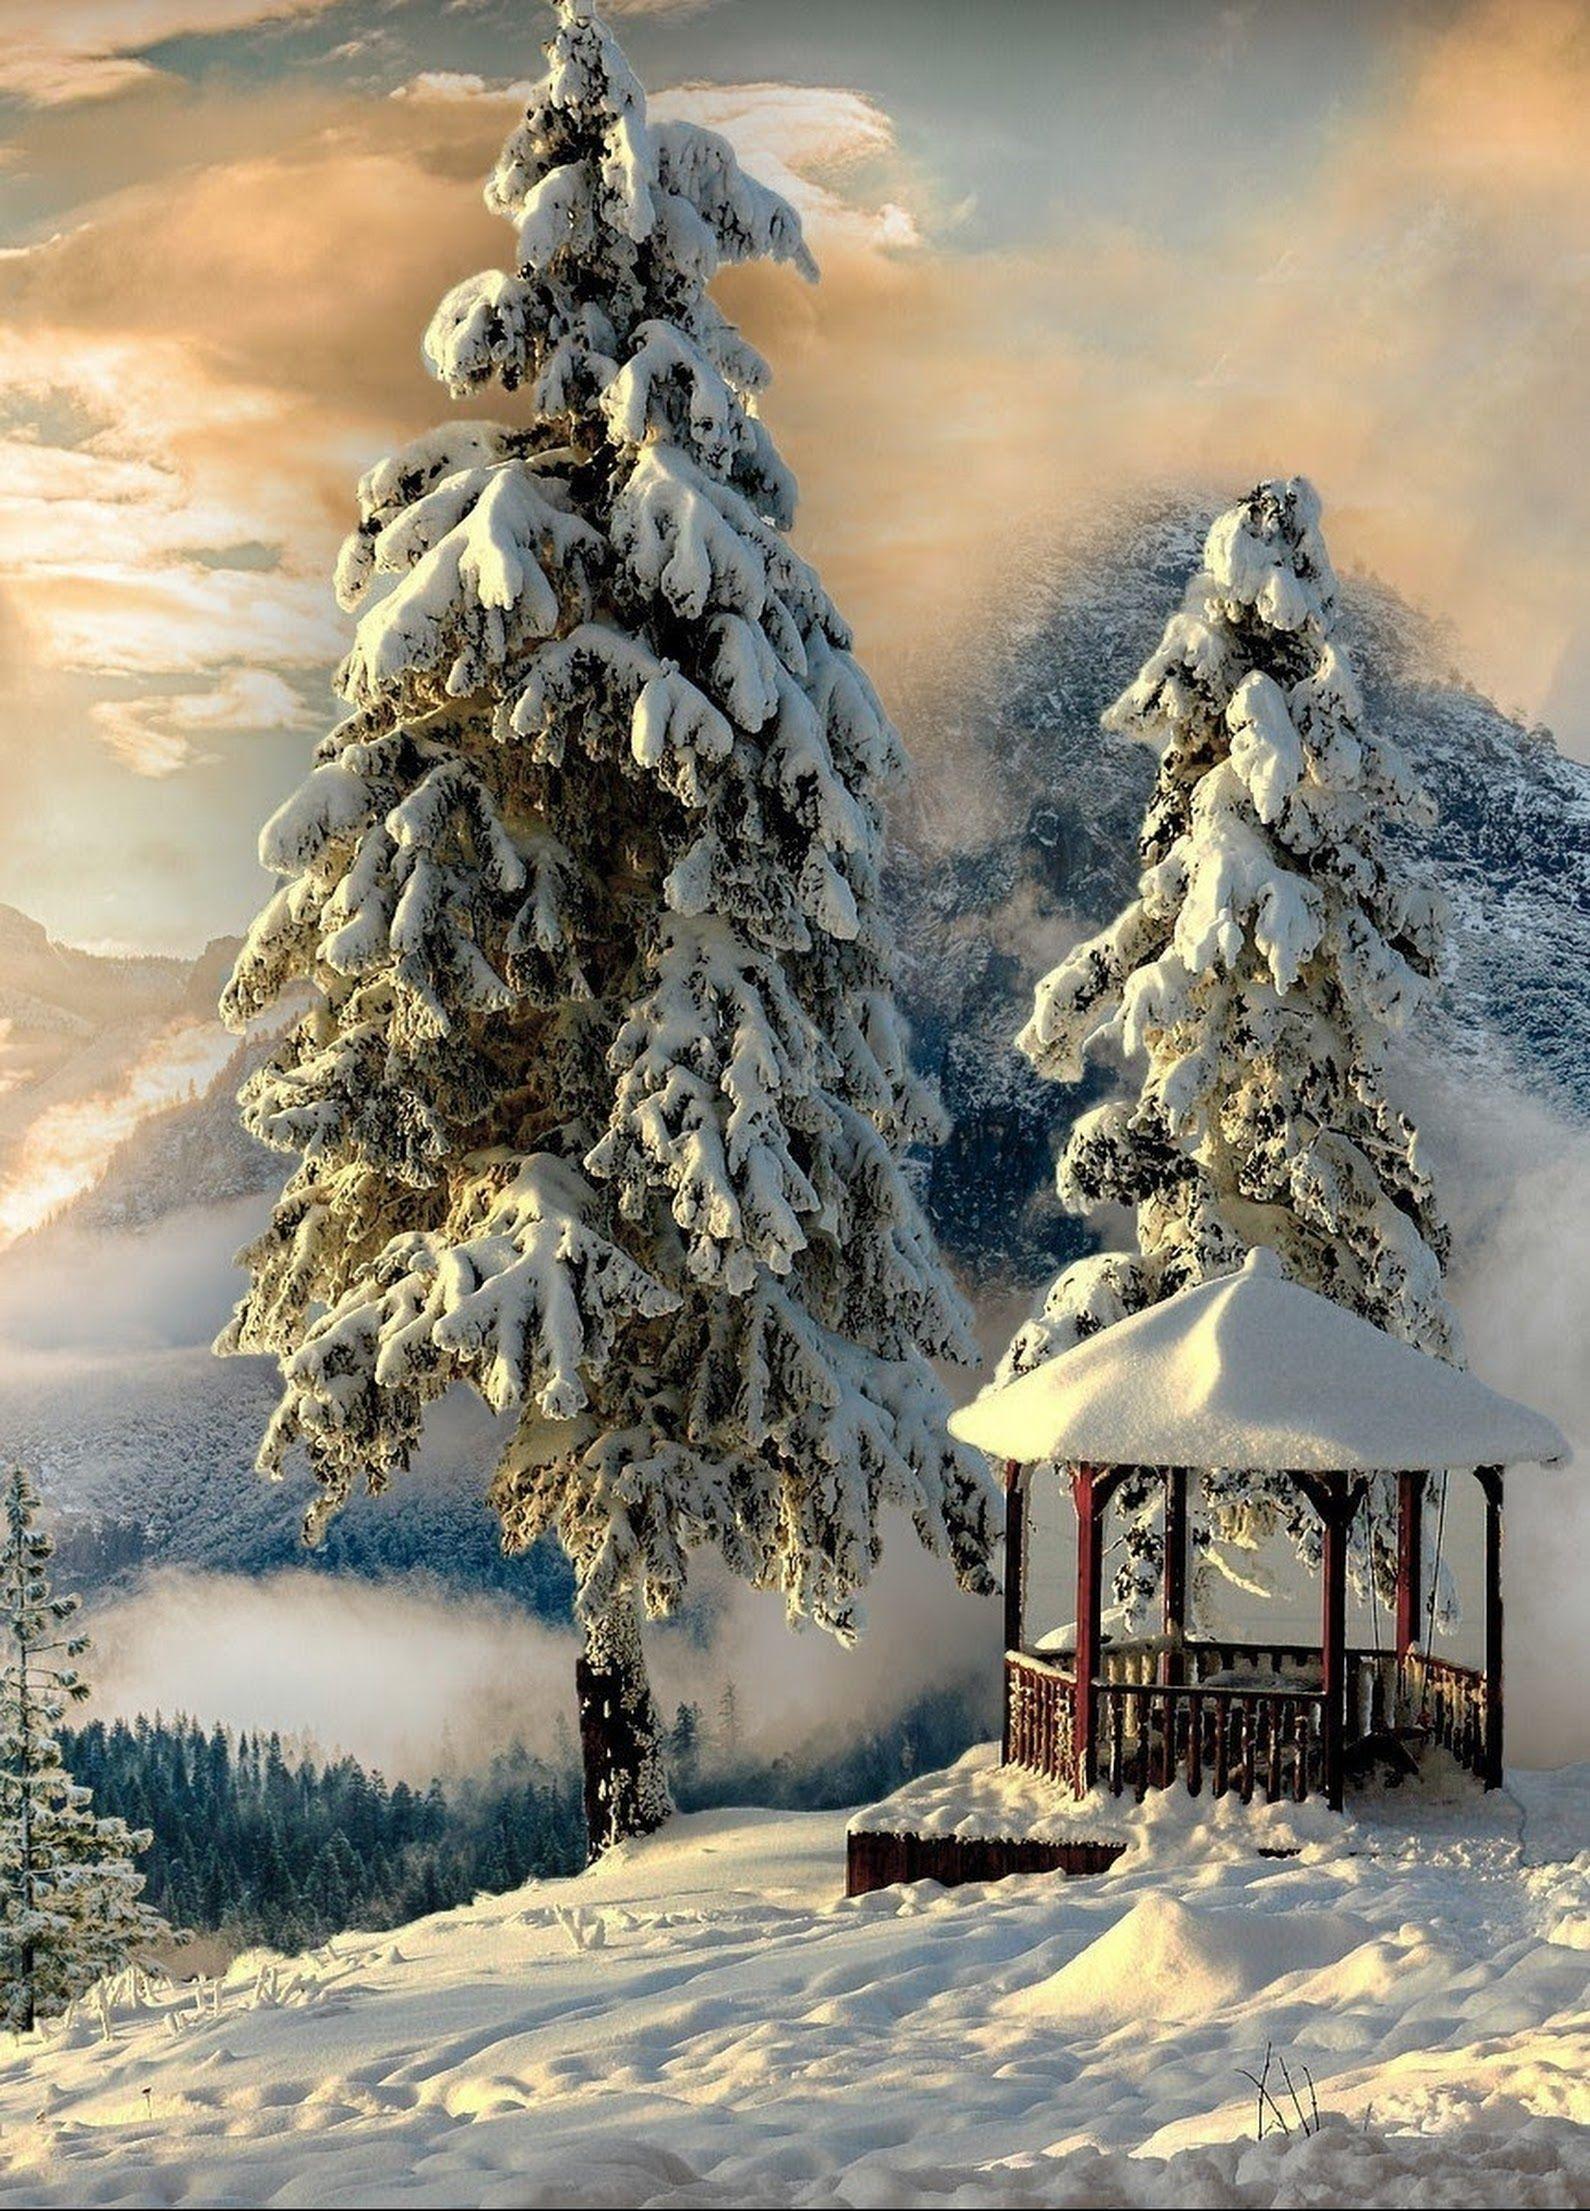 BELLO PAISAJE NEVADO - Isabel Carrasco - Google+   winter ...